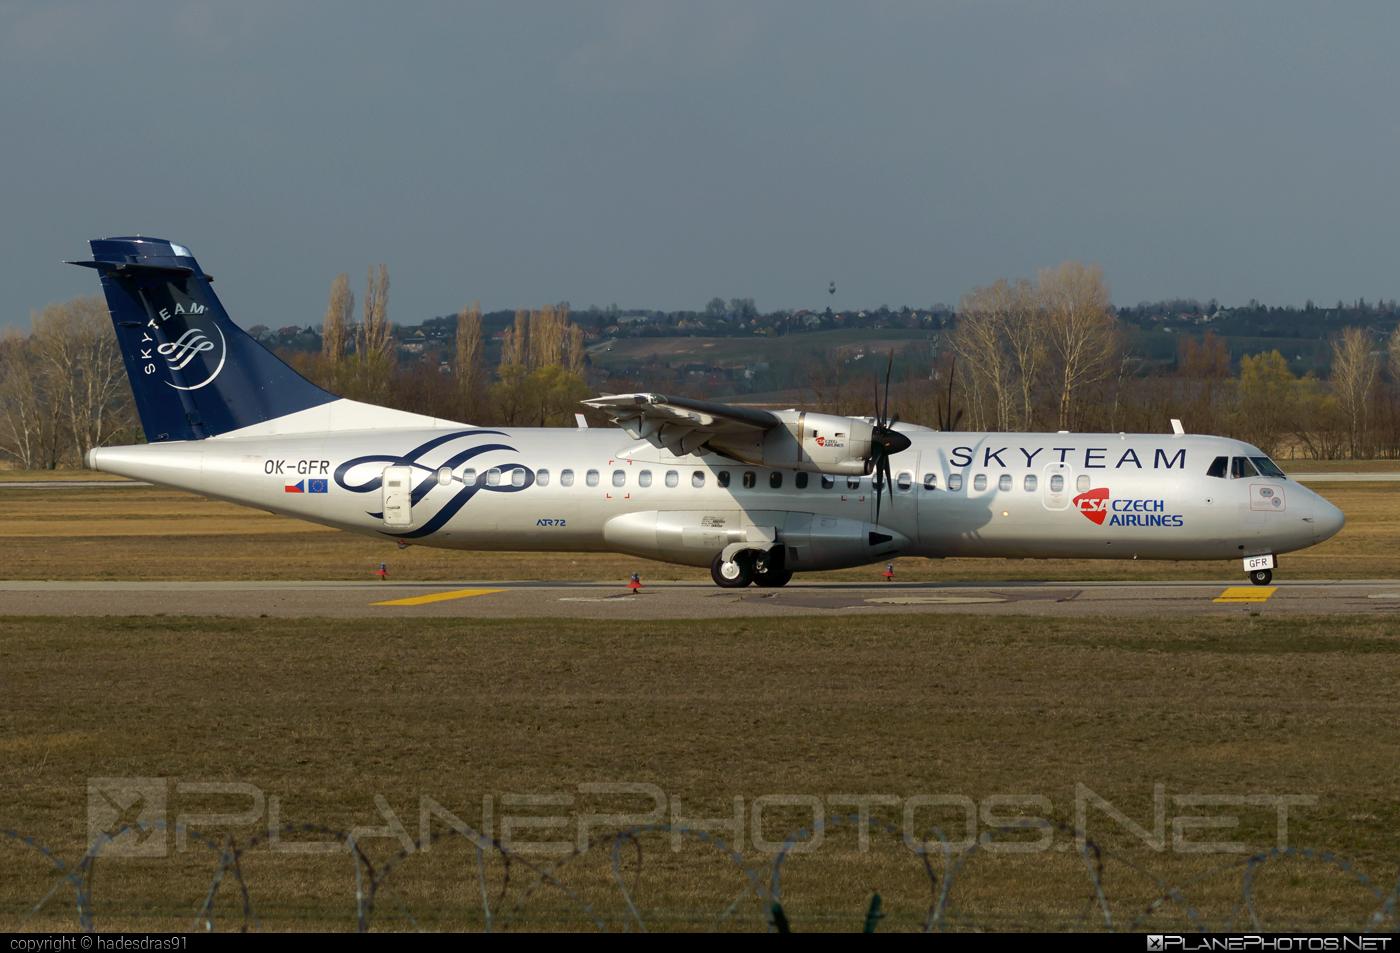 ATR 72-212A - OK-GFR operated by CSA Czech Airlines #atr #csa #czechairlines #skyteam